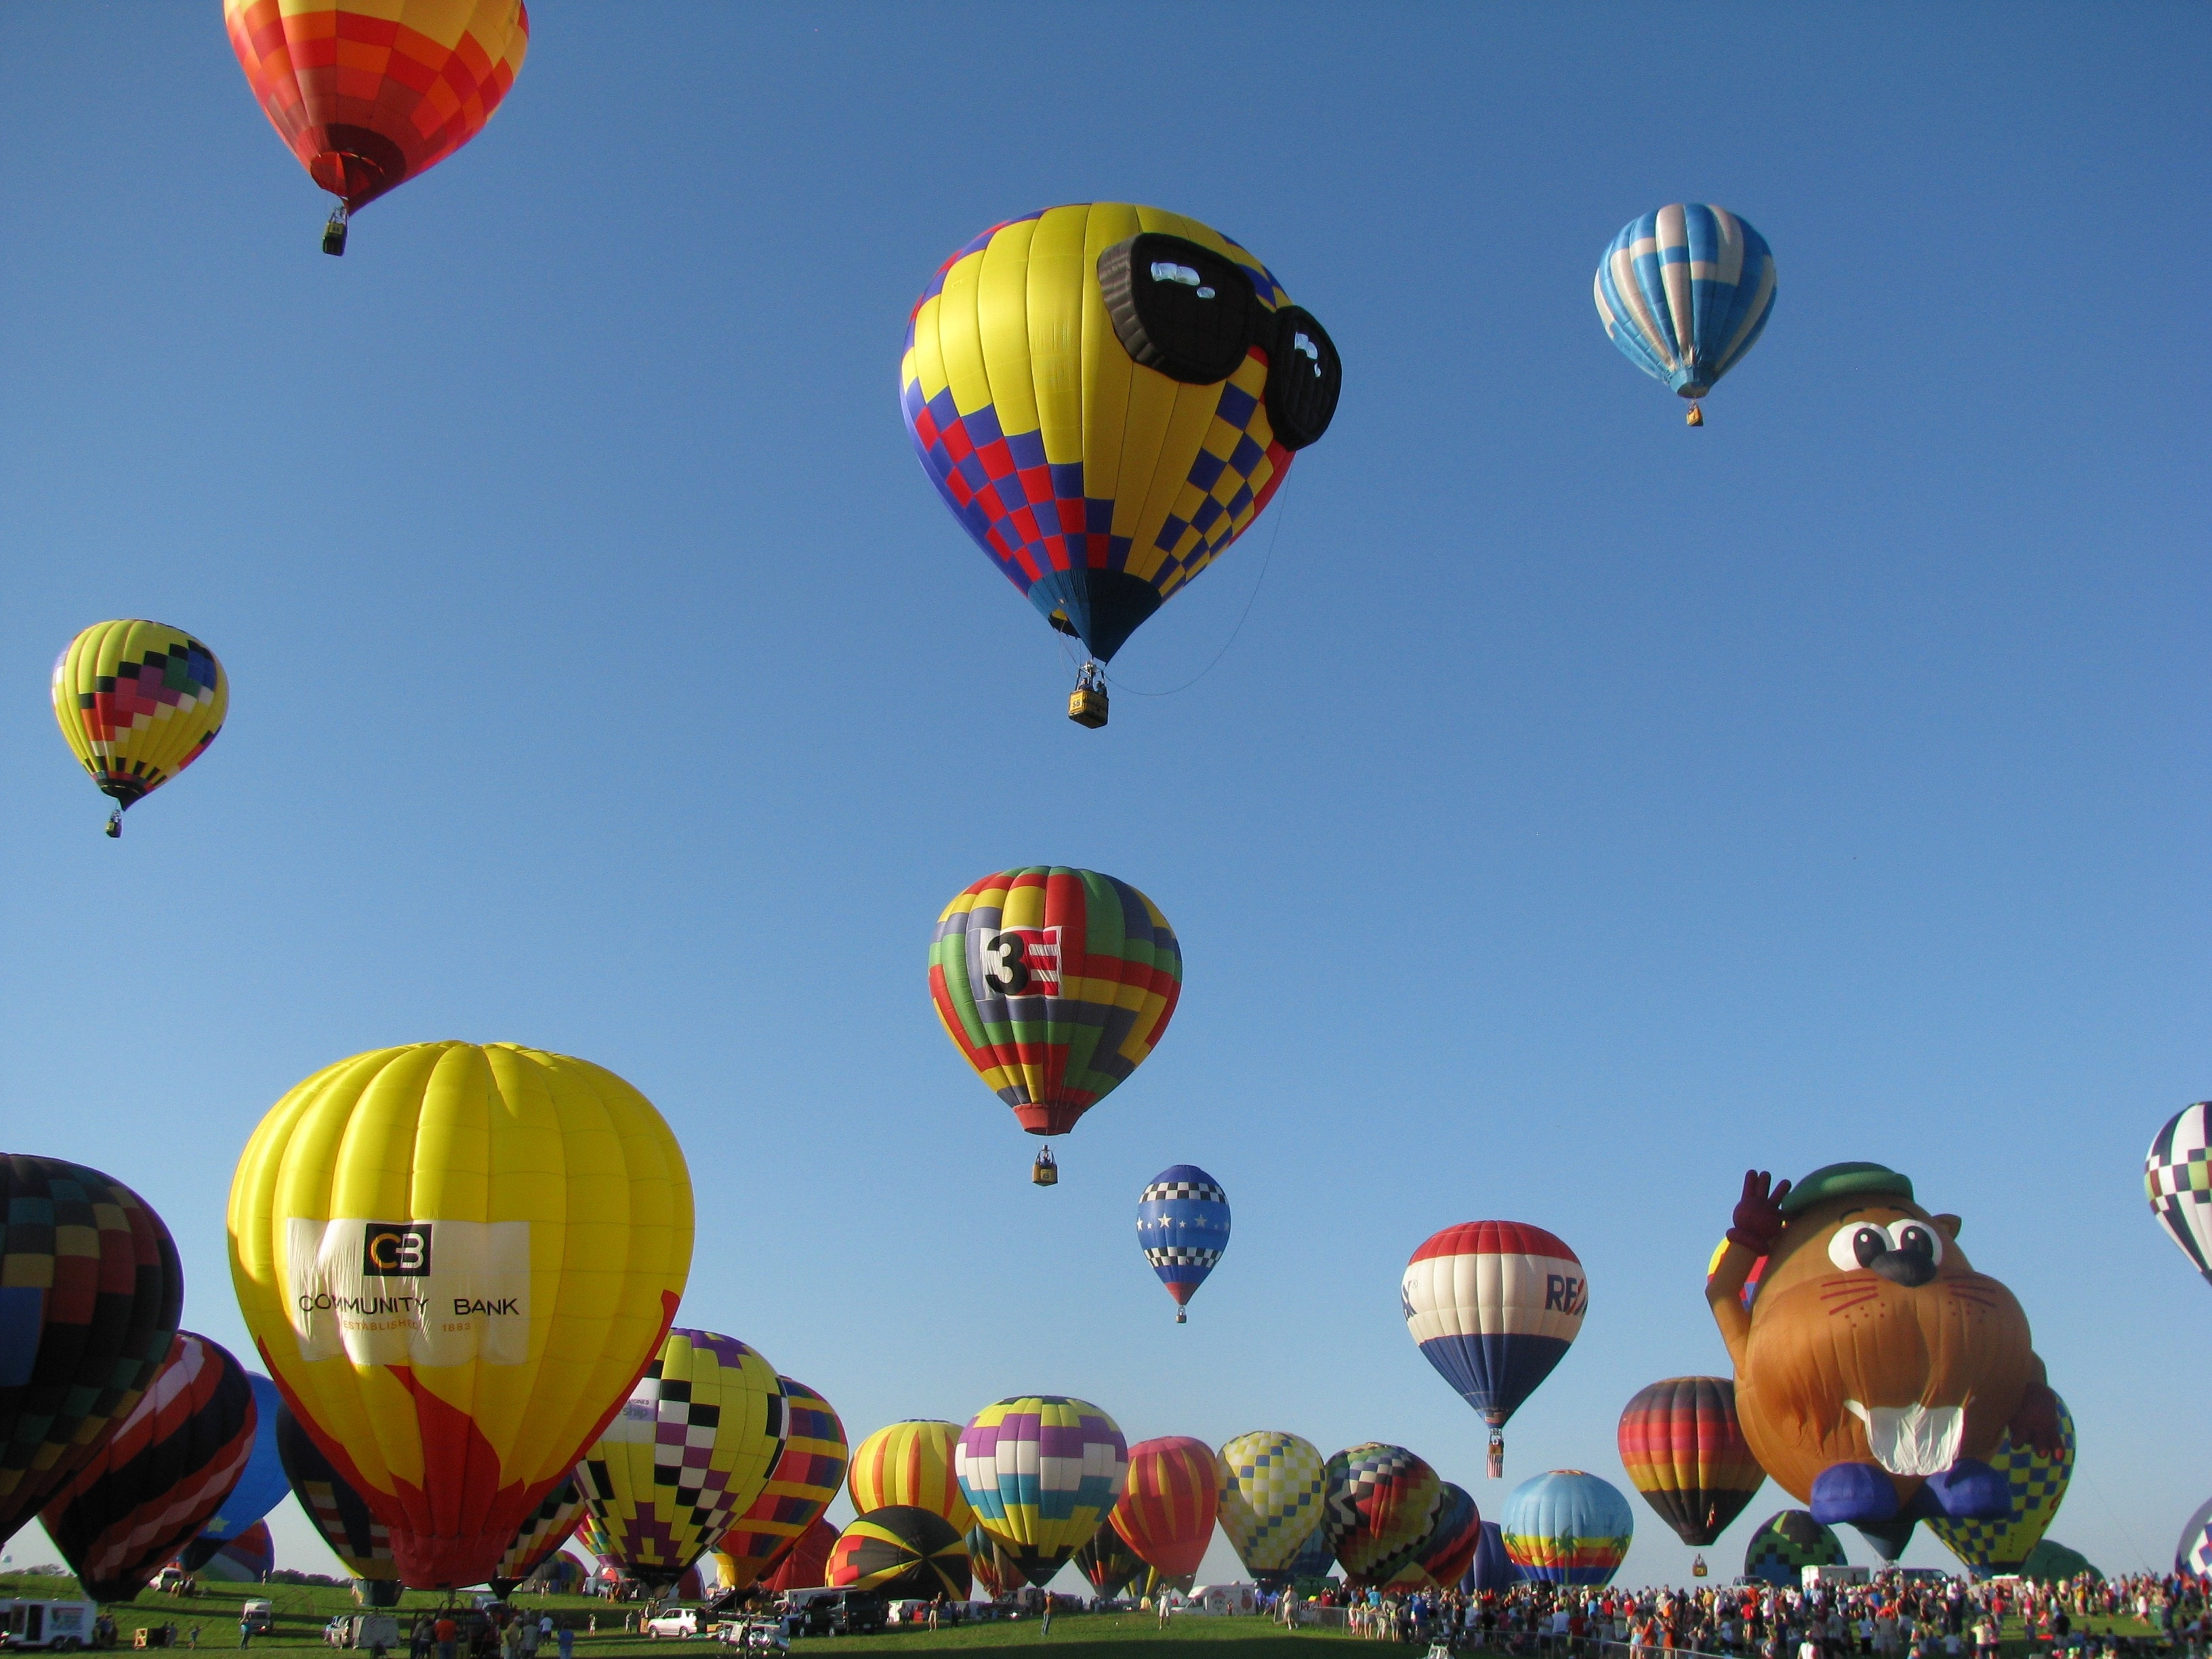 Festivals - image hot-air-balloon-2056894 on http://www.4kfreelance.com